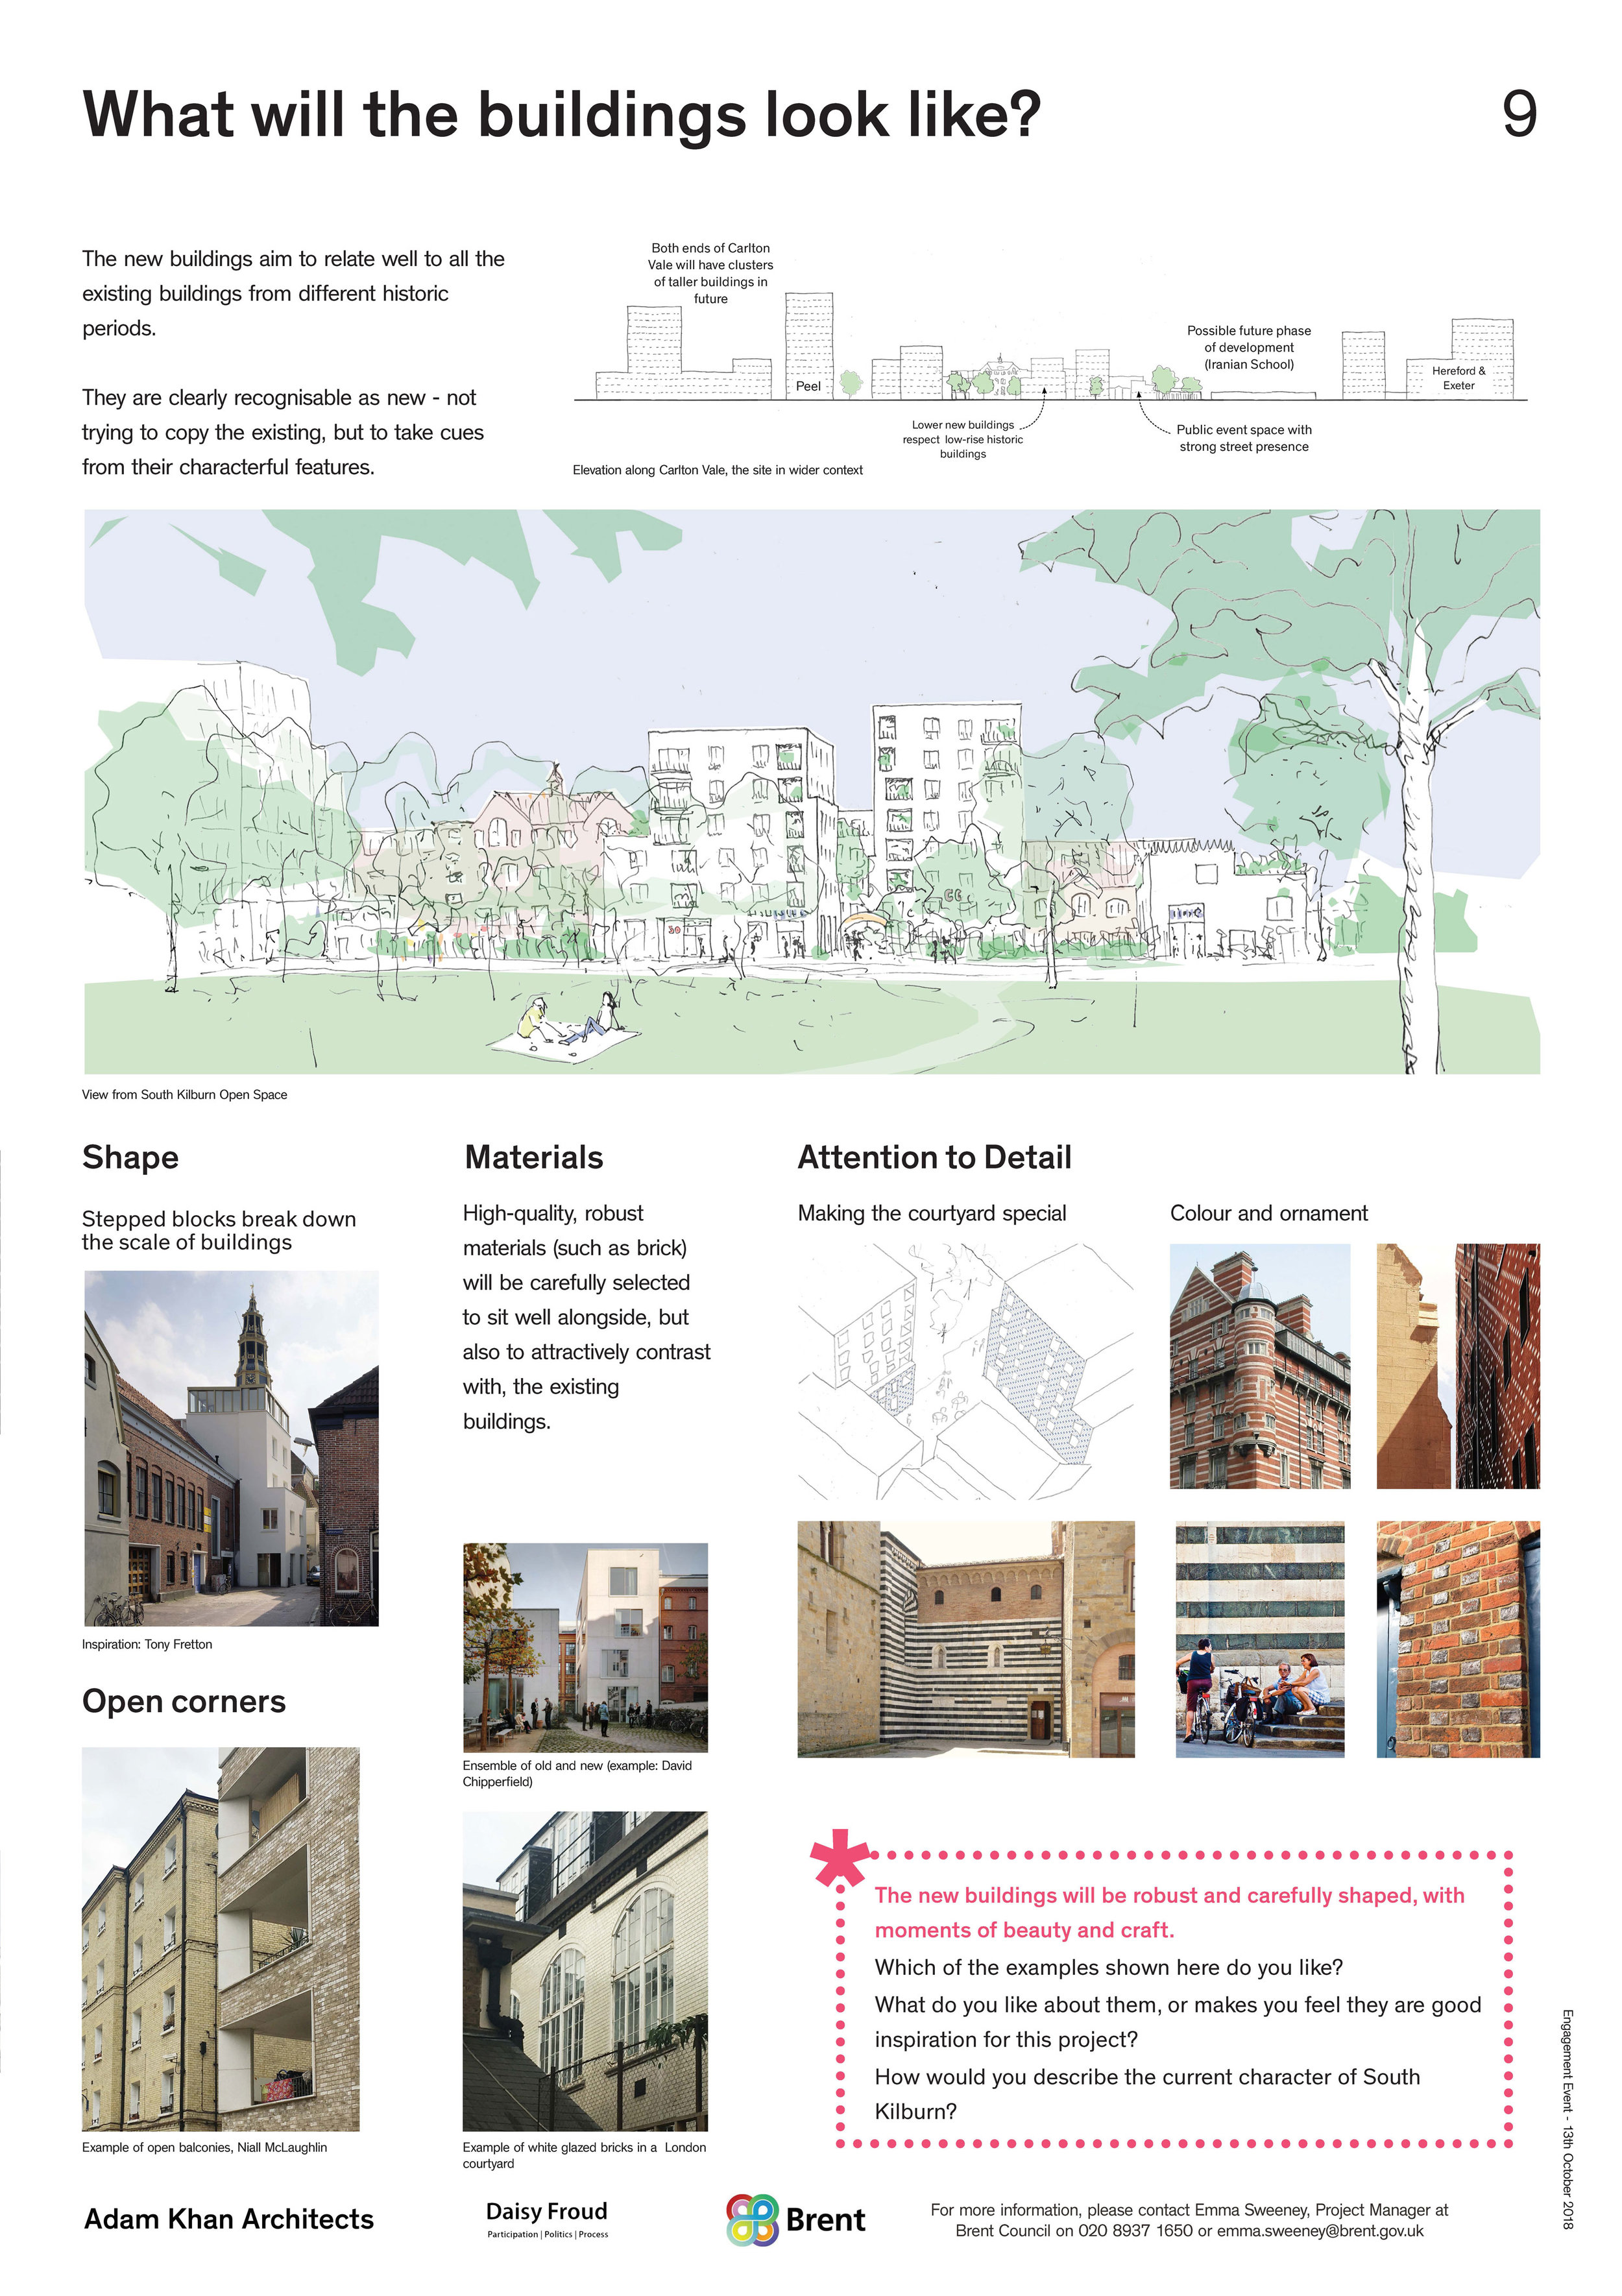 181009_Public-Consultation-03_LN_Page_9.jpg